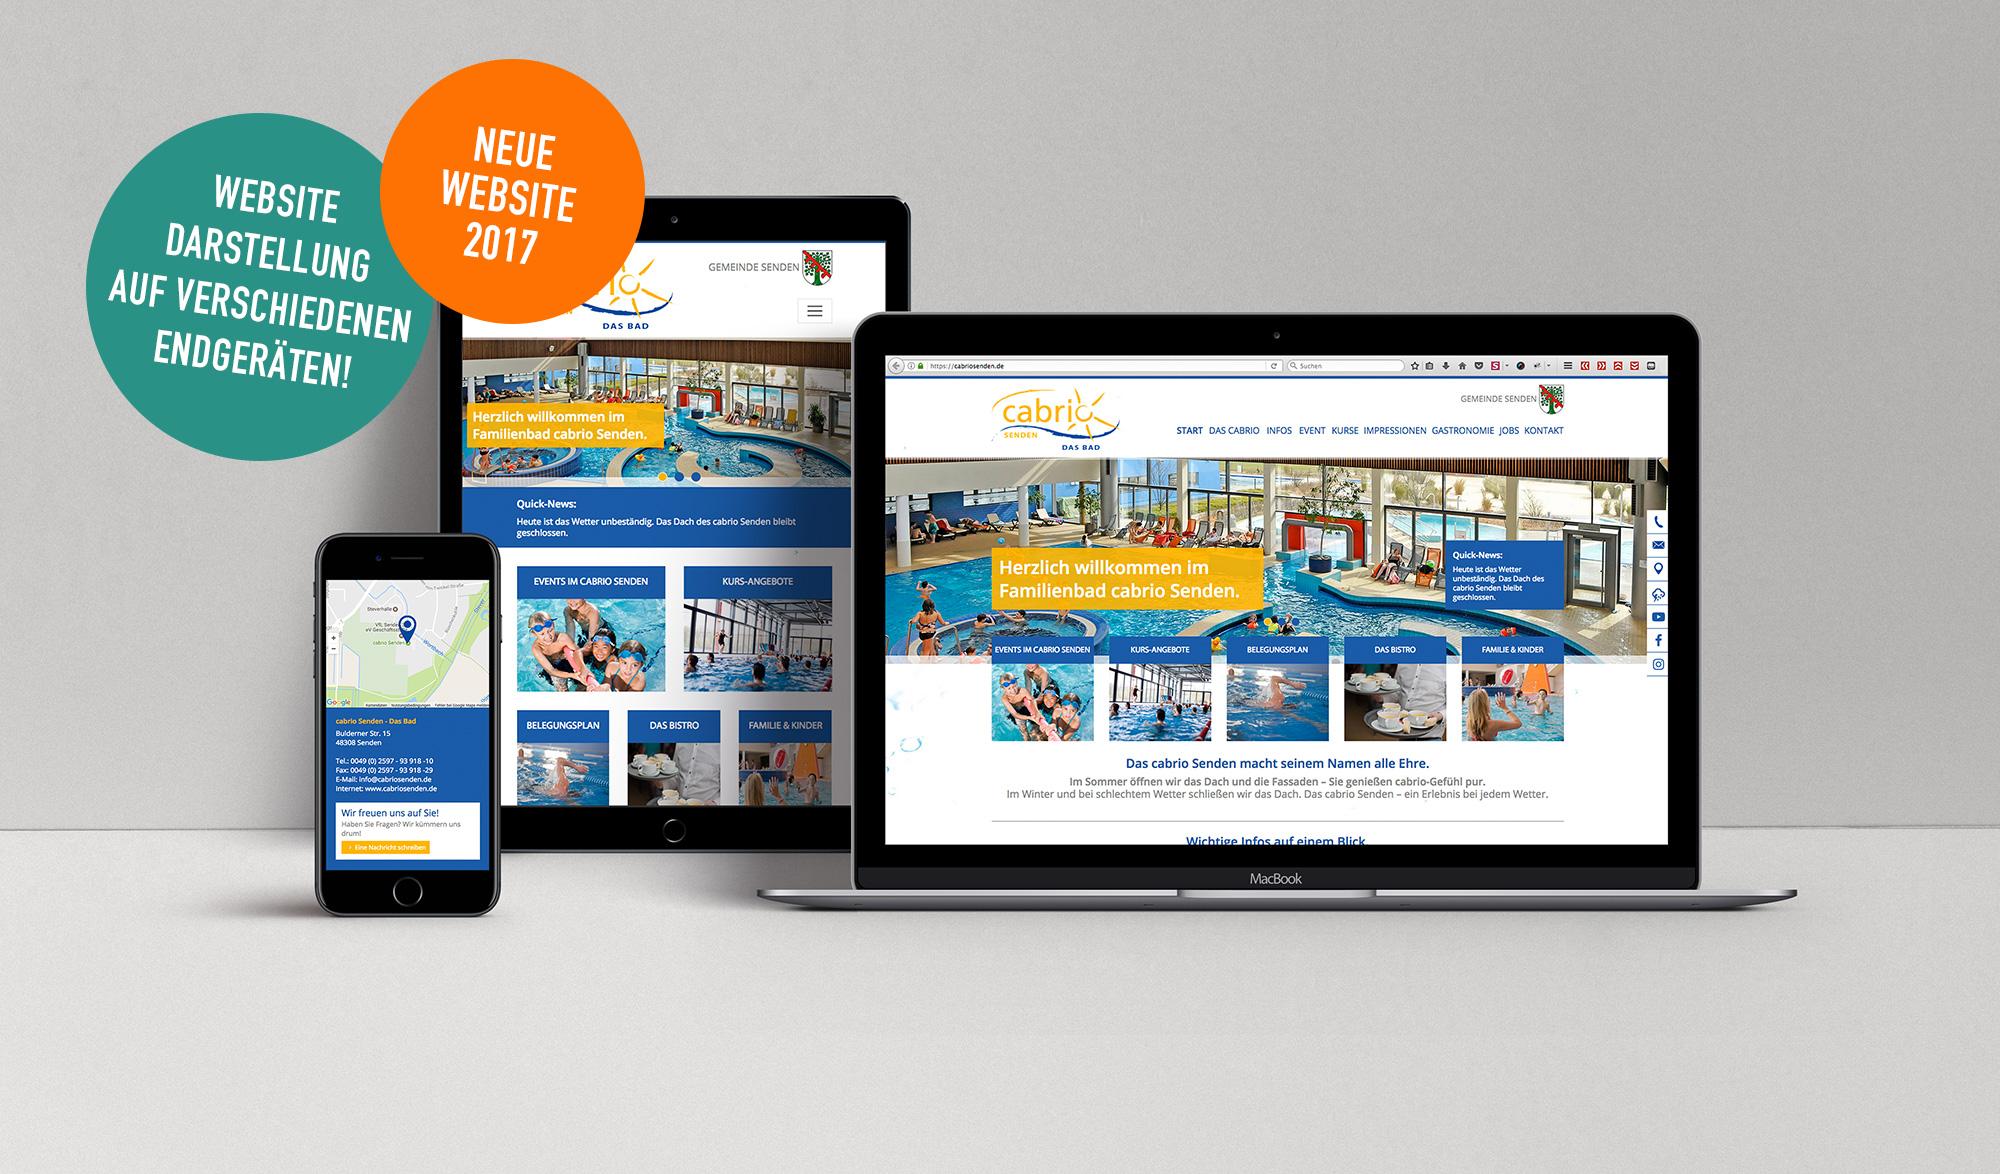 Neue Website für cabrio Senden - Das Bad!